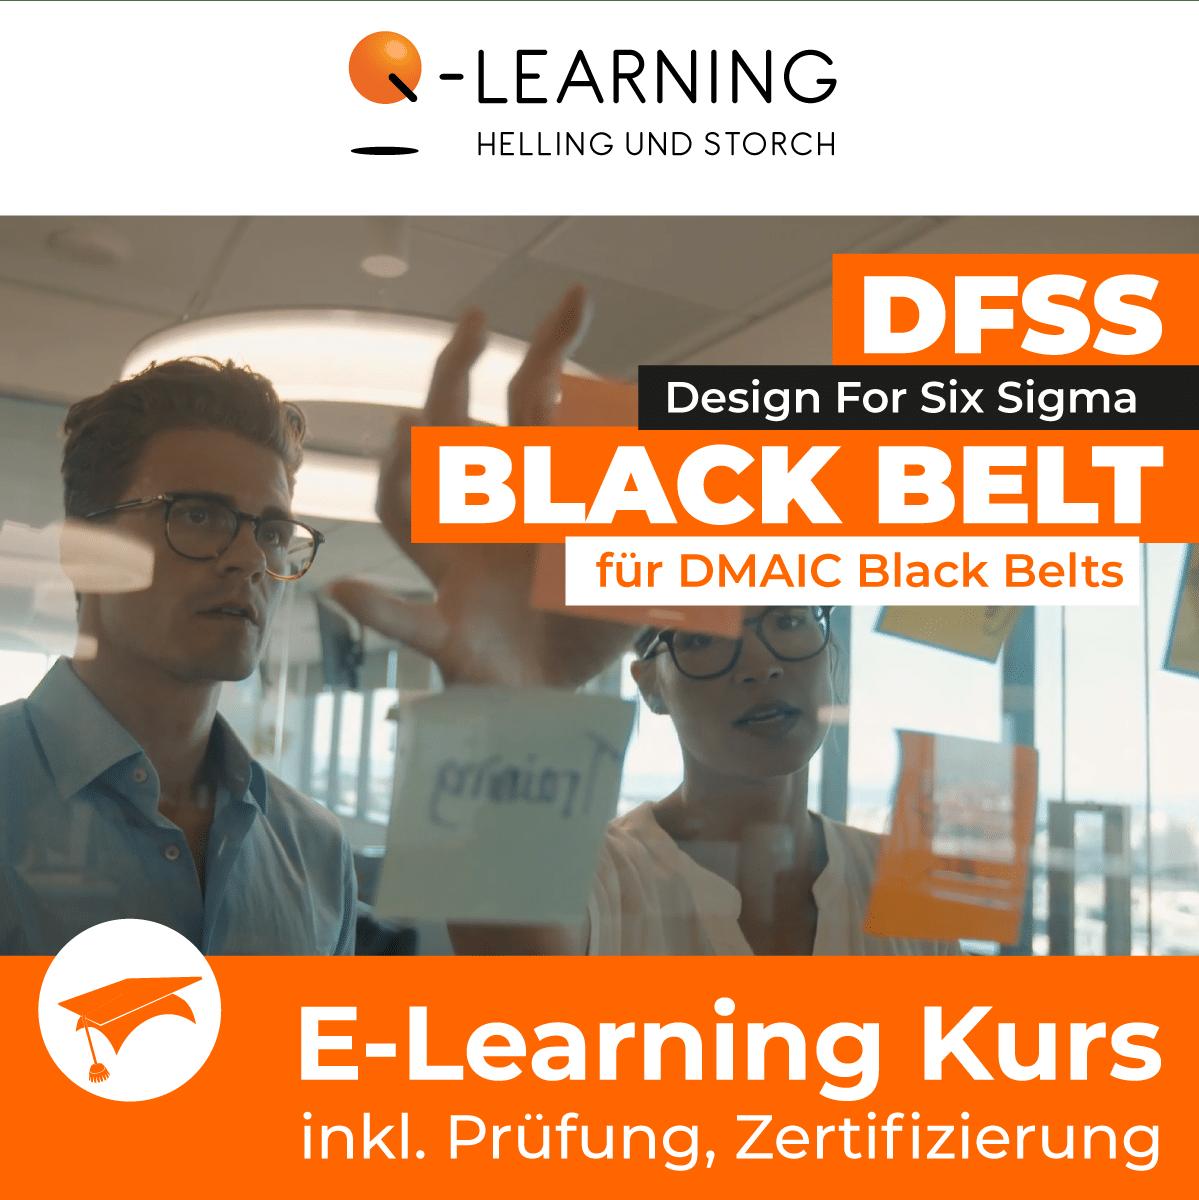 Produktbild DFSS BLACKBELT für SIX SIGMA BLACK BELT E-Learning Kurs